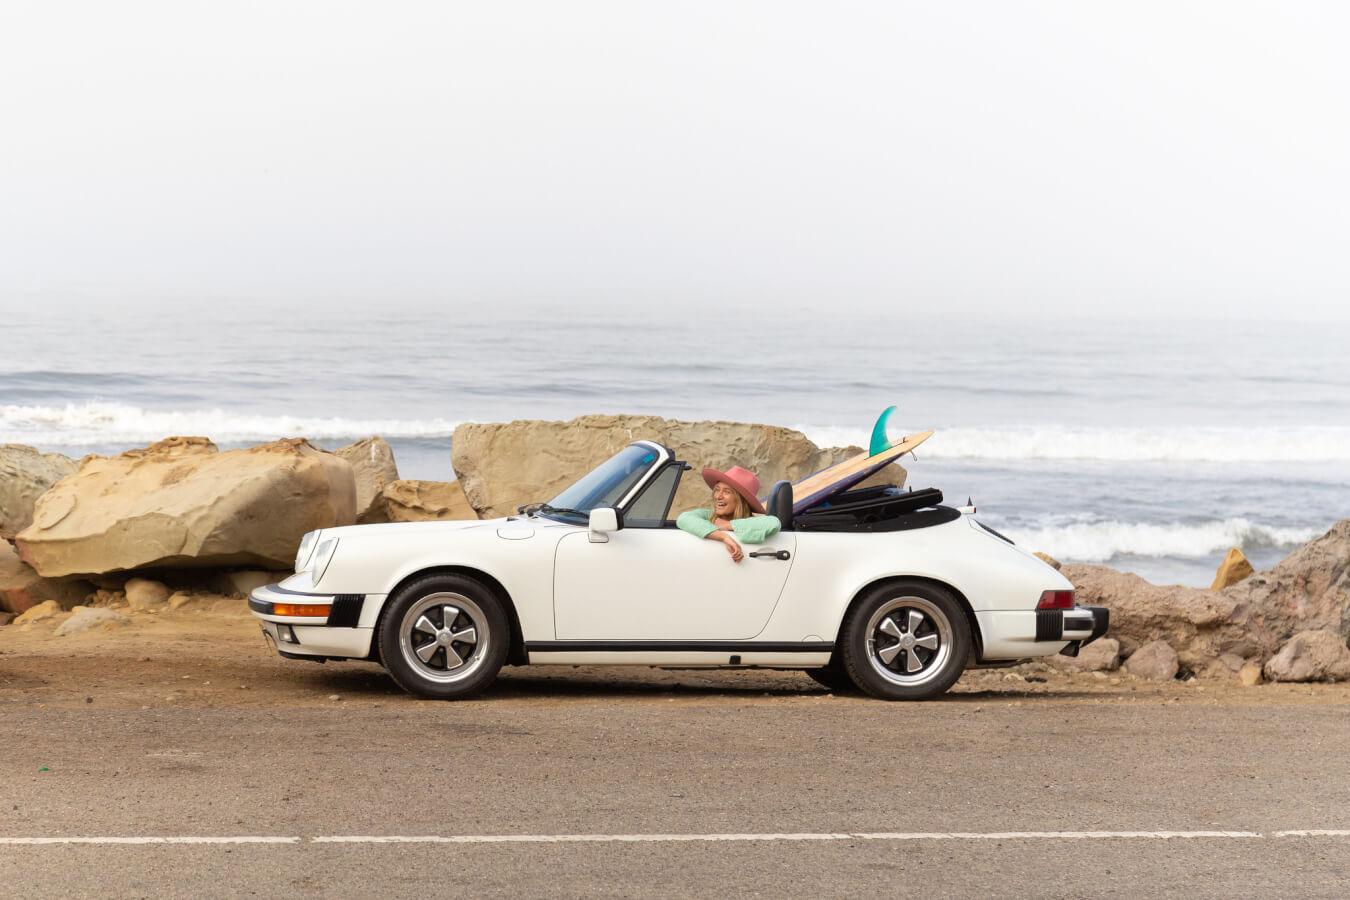 Briana in car on ventura coast